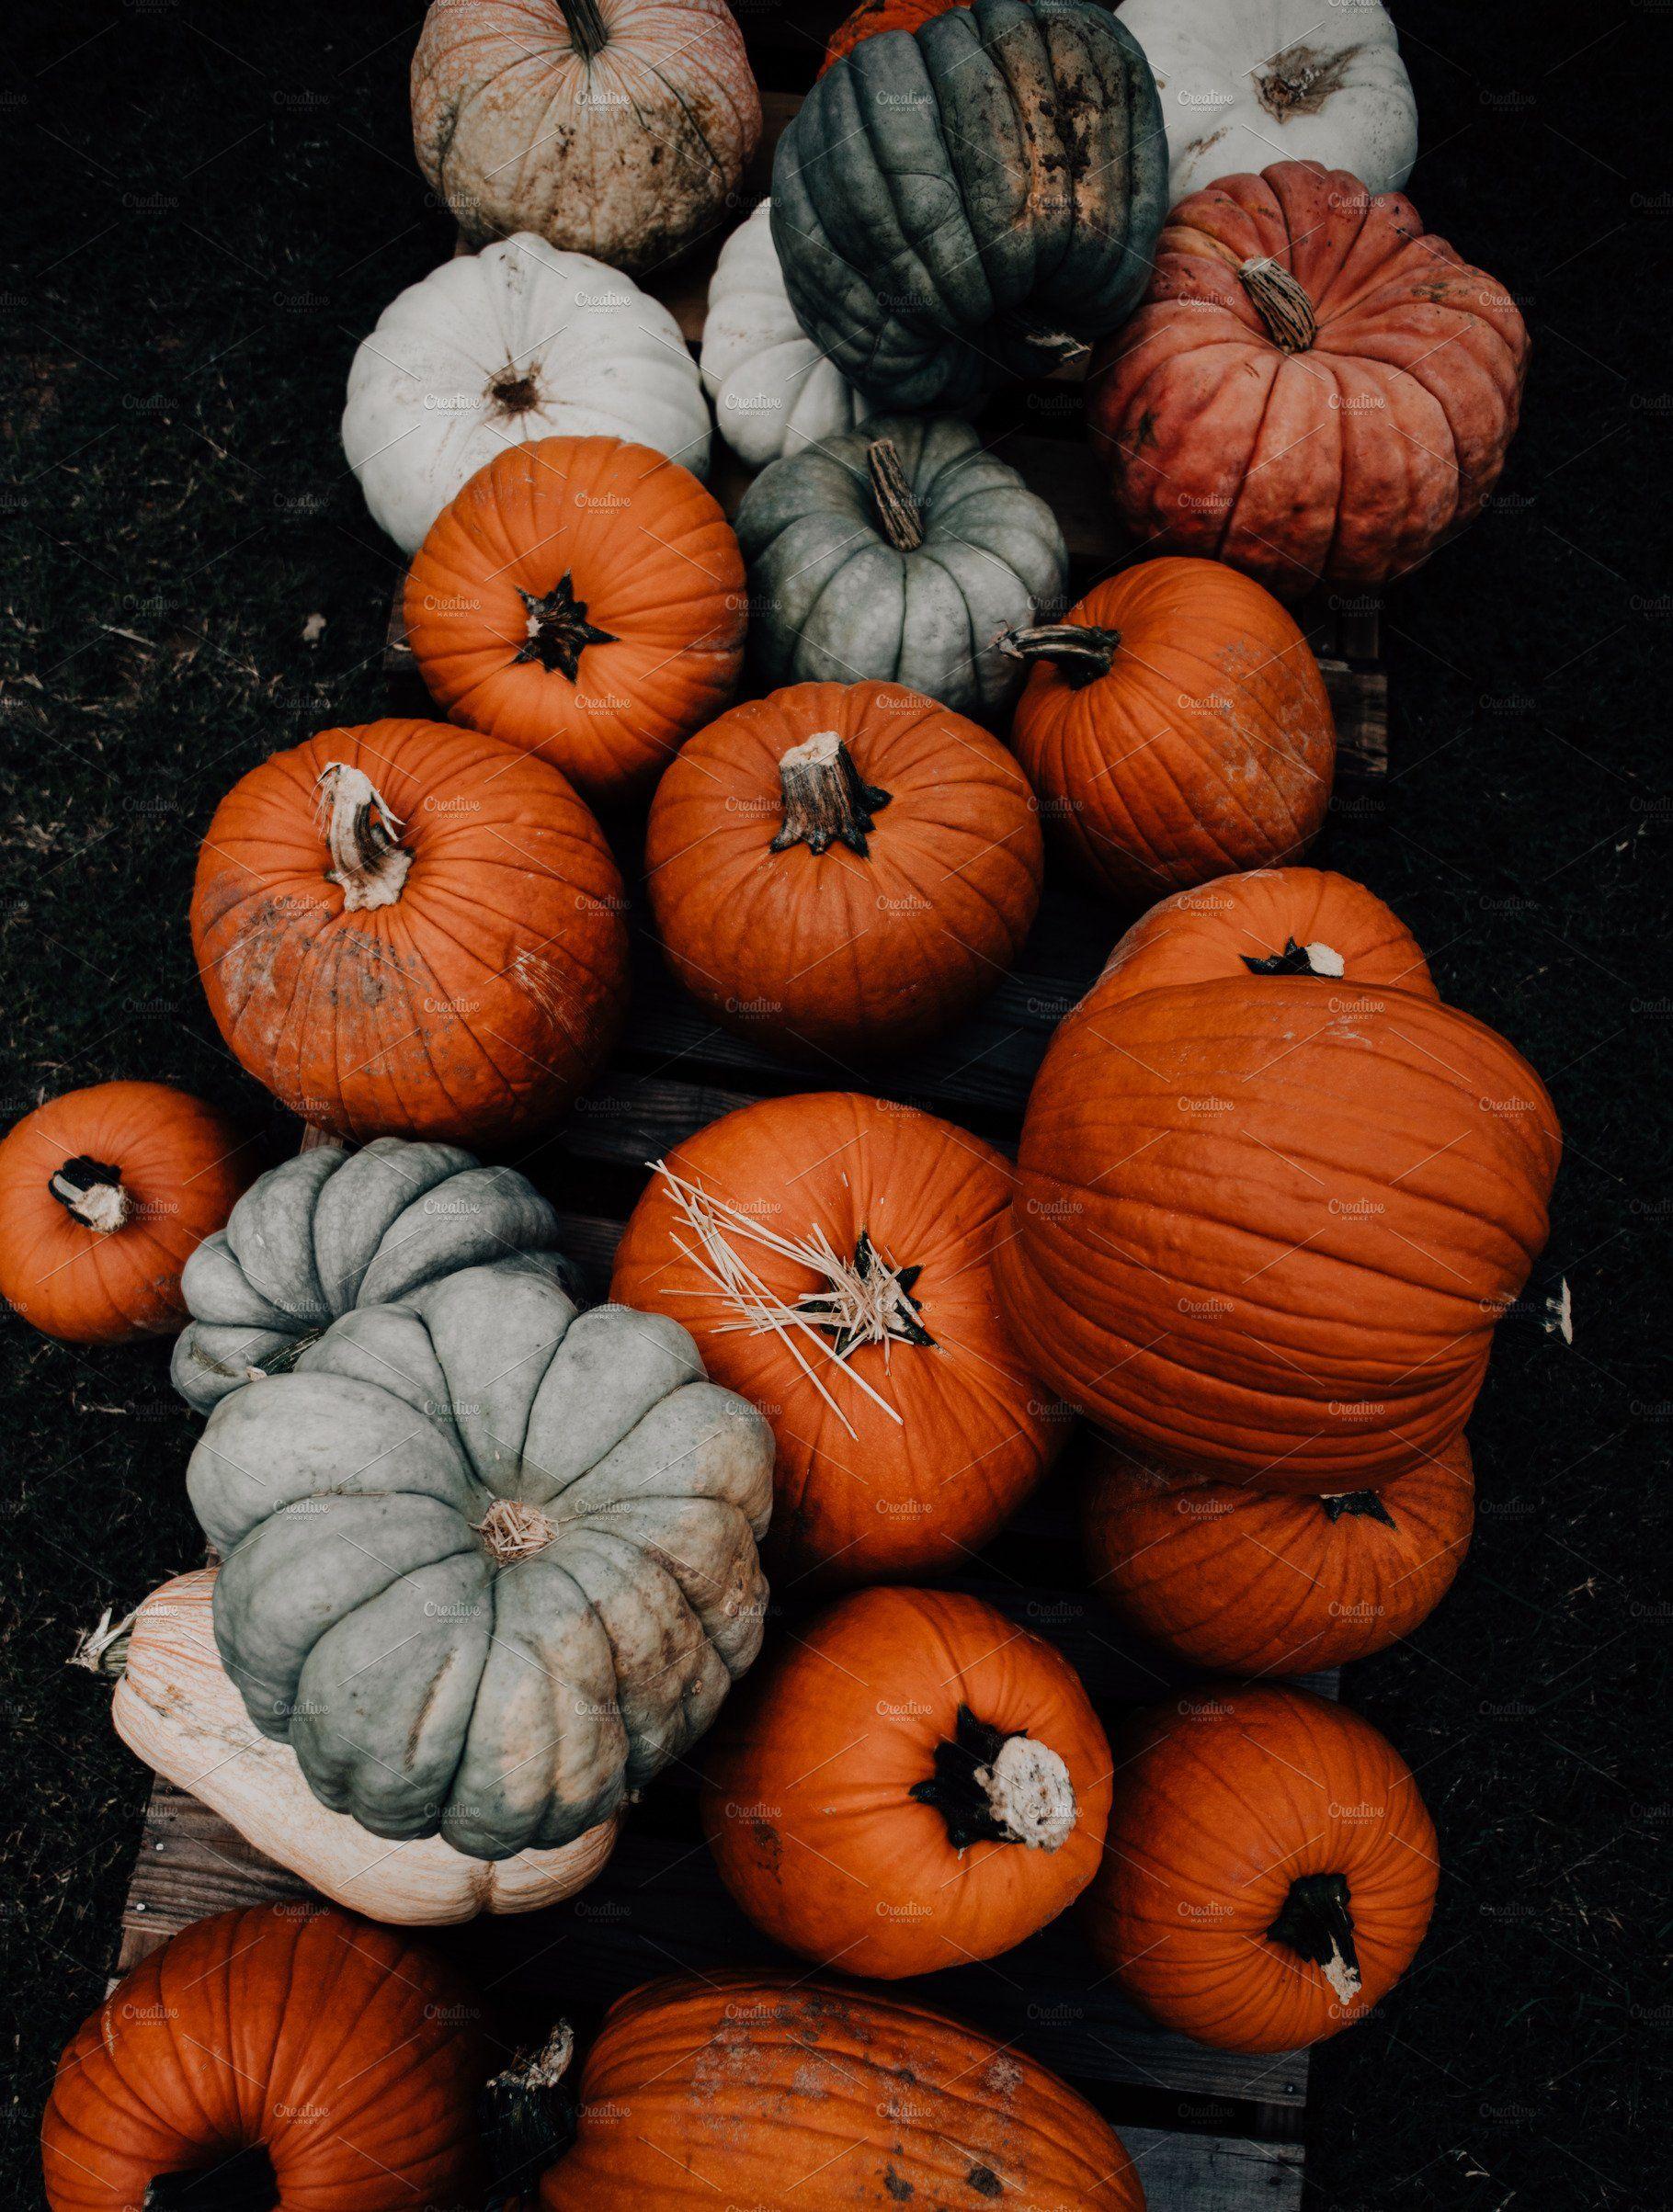 Fall Pumpkin Patch Farmers Market by Nine graphy on